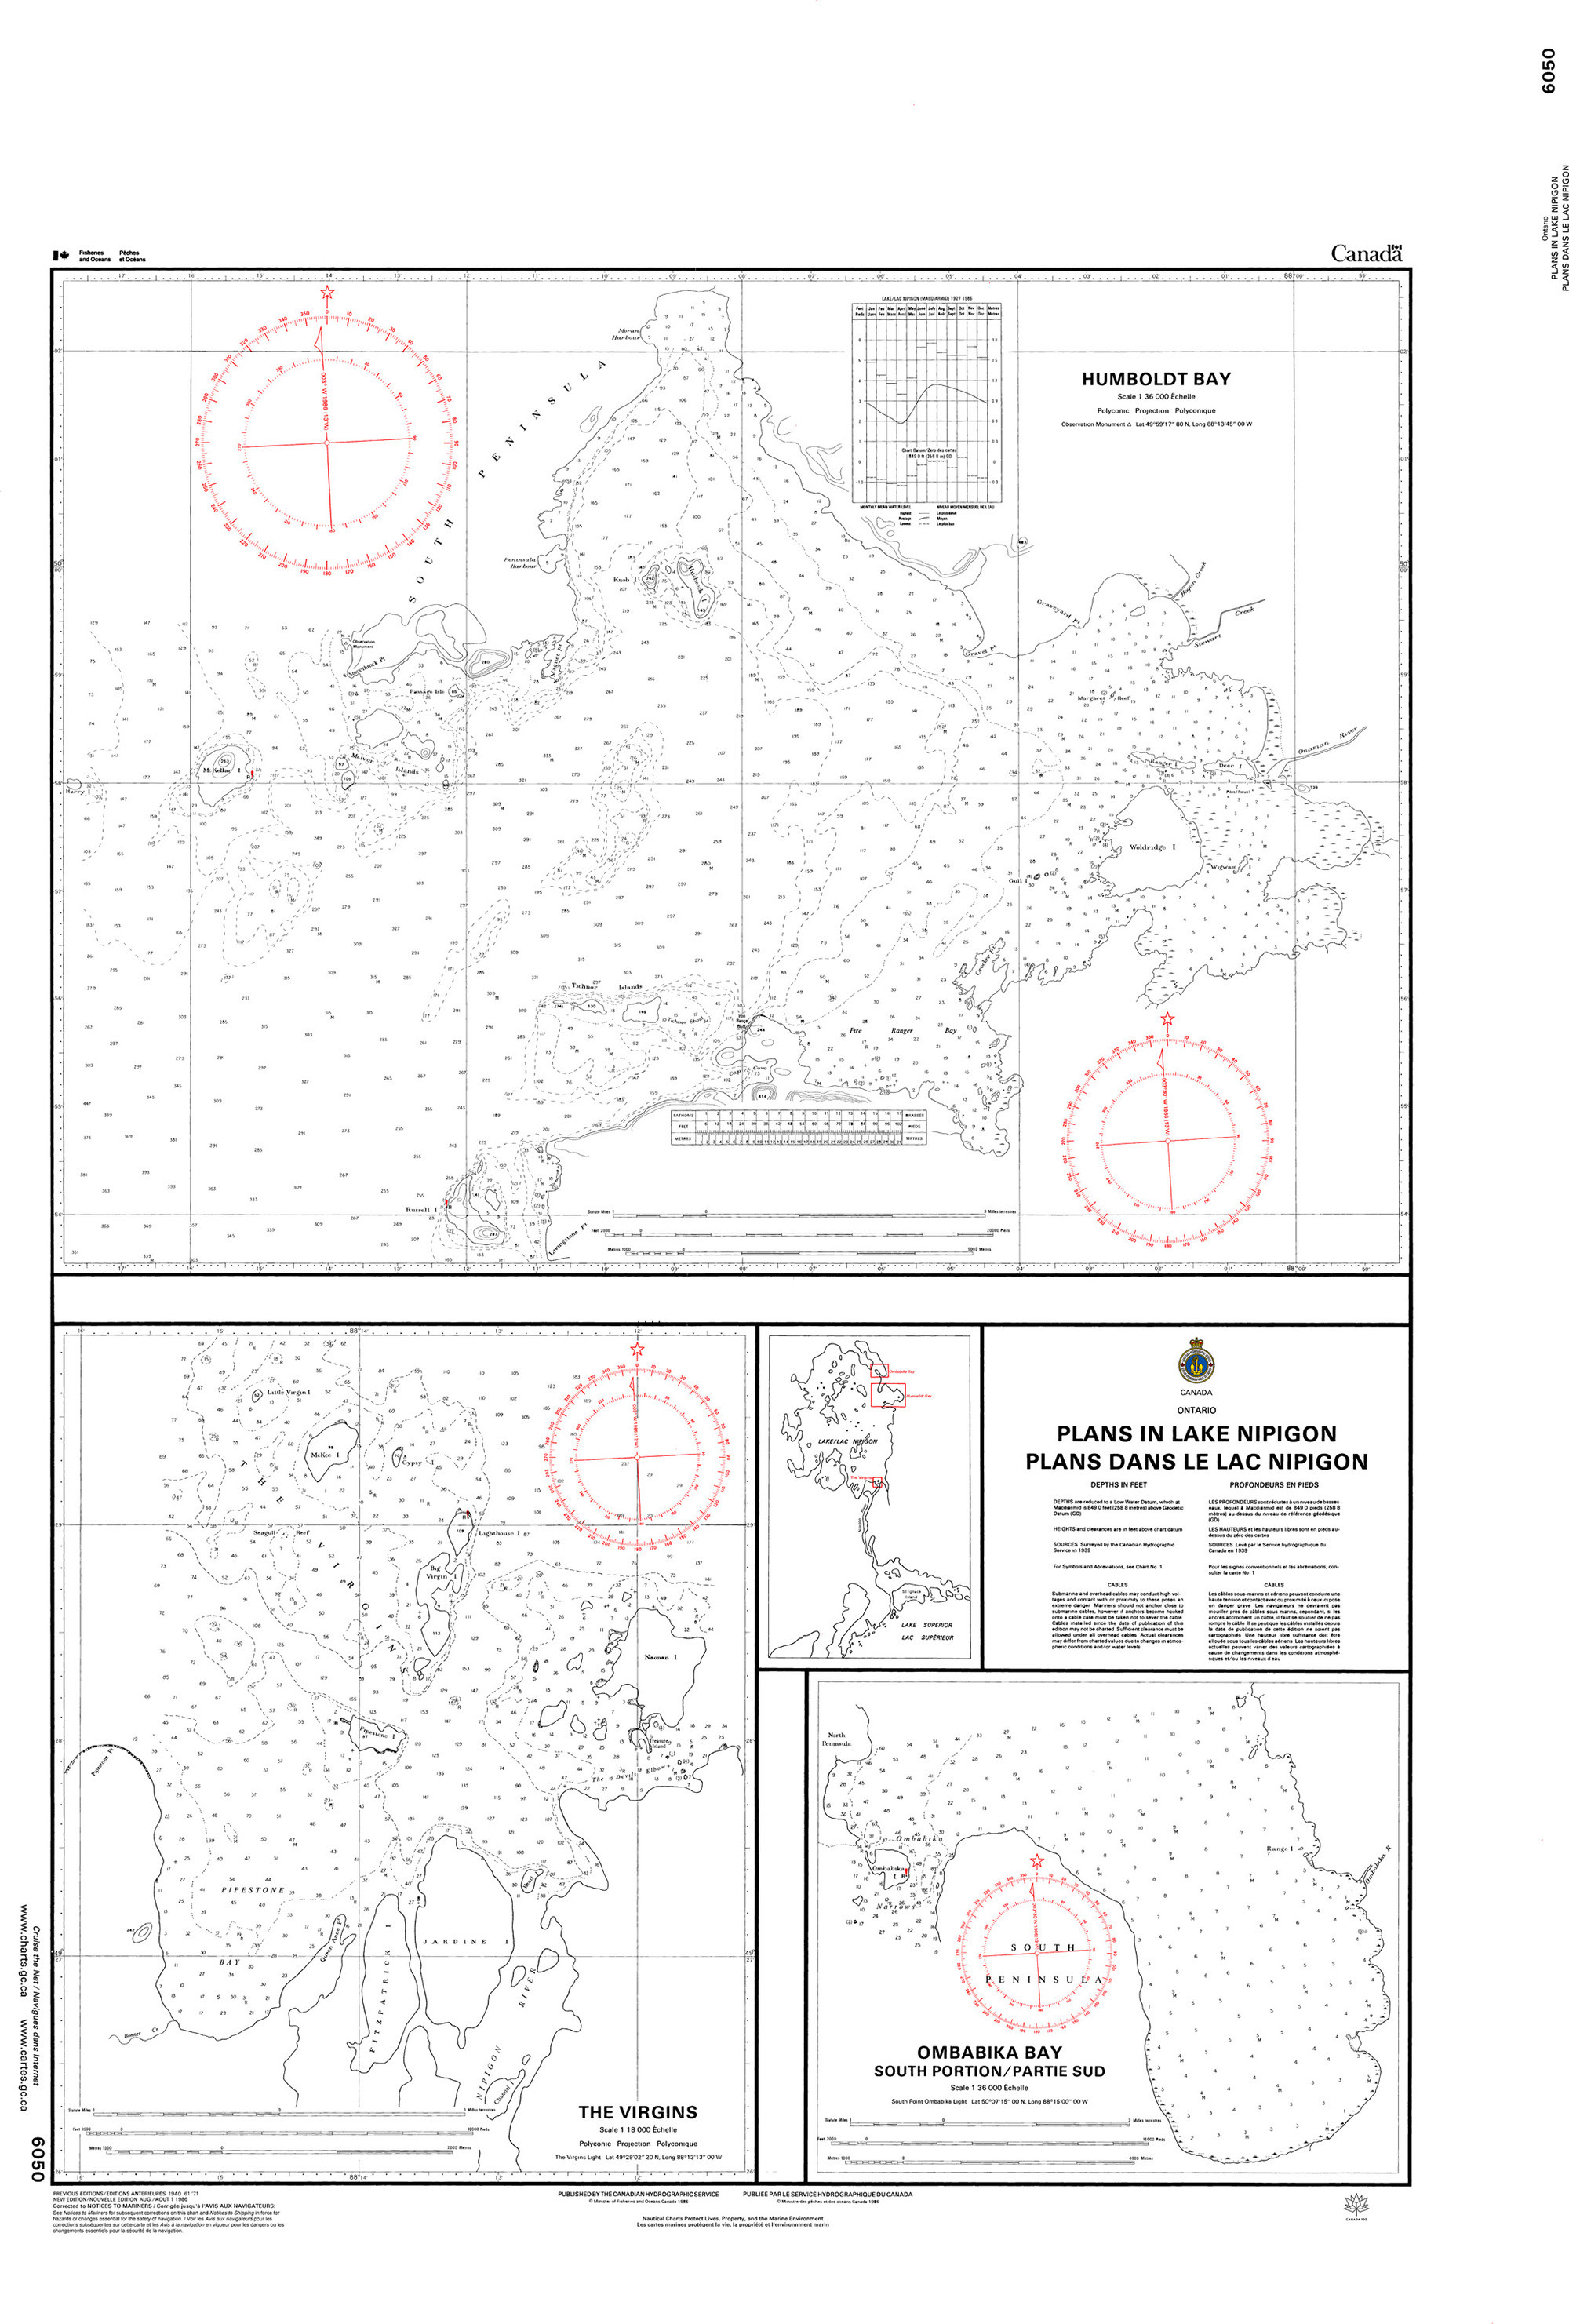 CHS Nautical Chart - CHS6050 Plans in Lake Nipigon / Plans dans le lac Nipigon